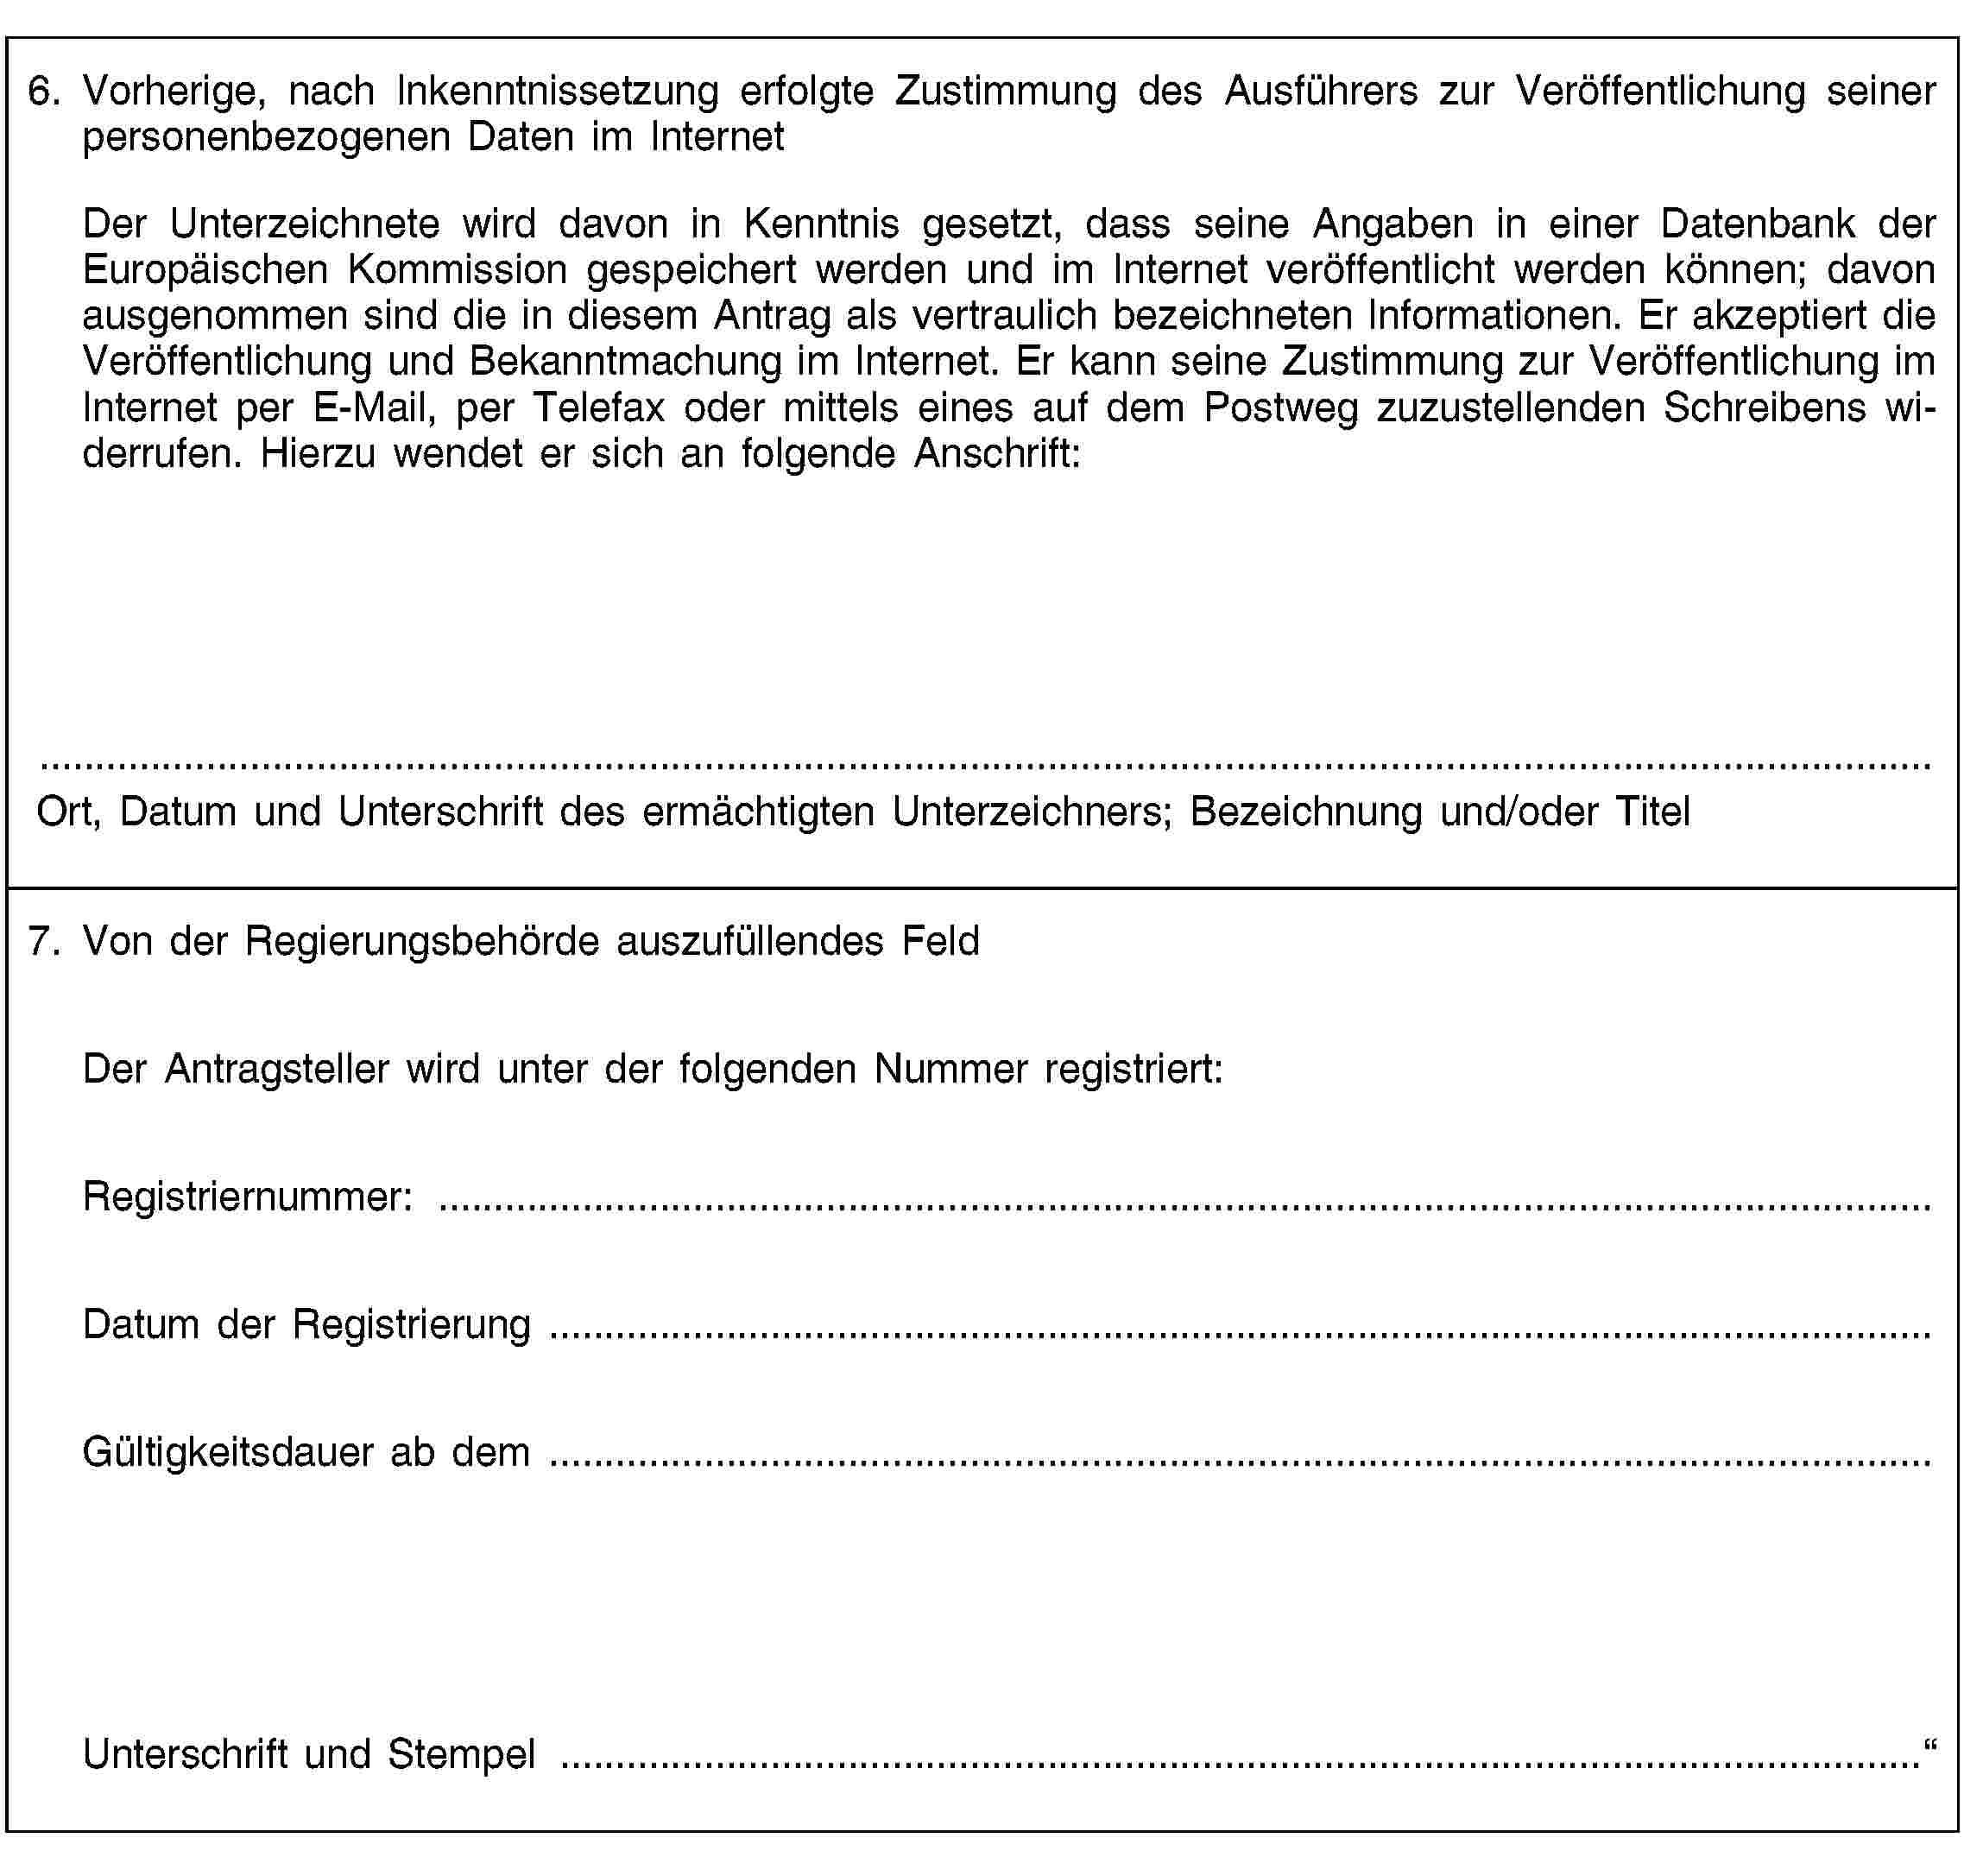 EUR-Lex - 01993R2454-20120101 - EN - EUR-Lex